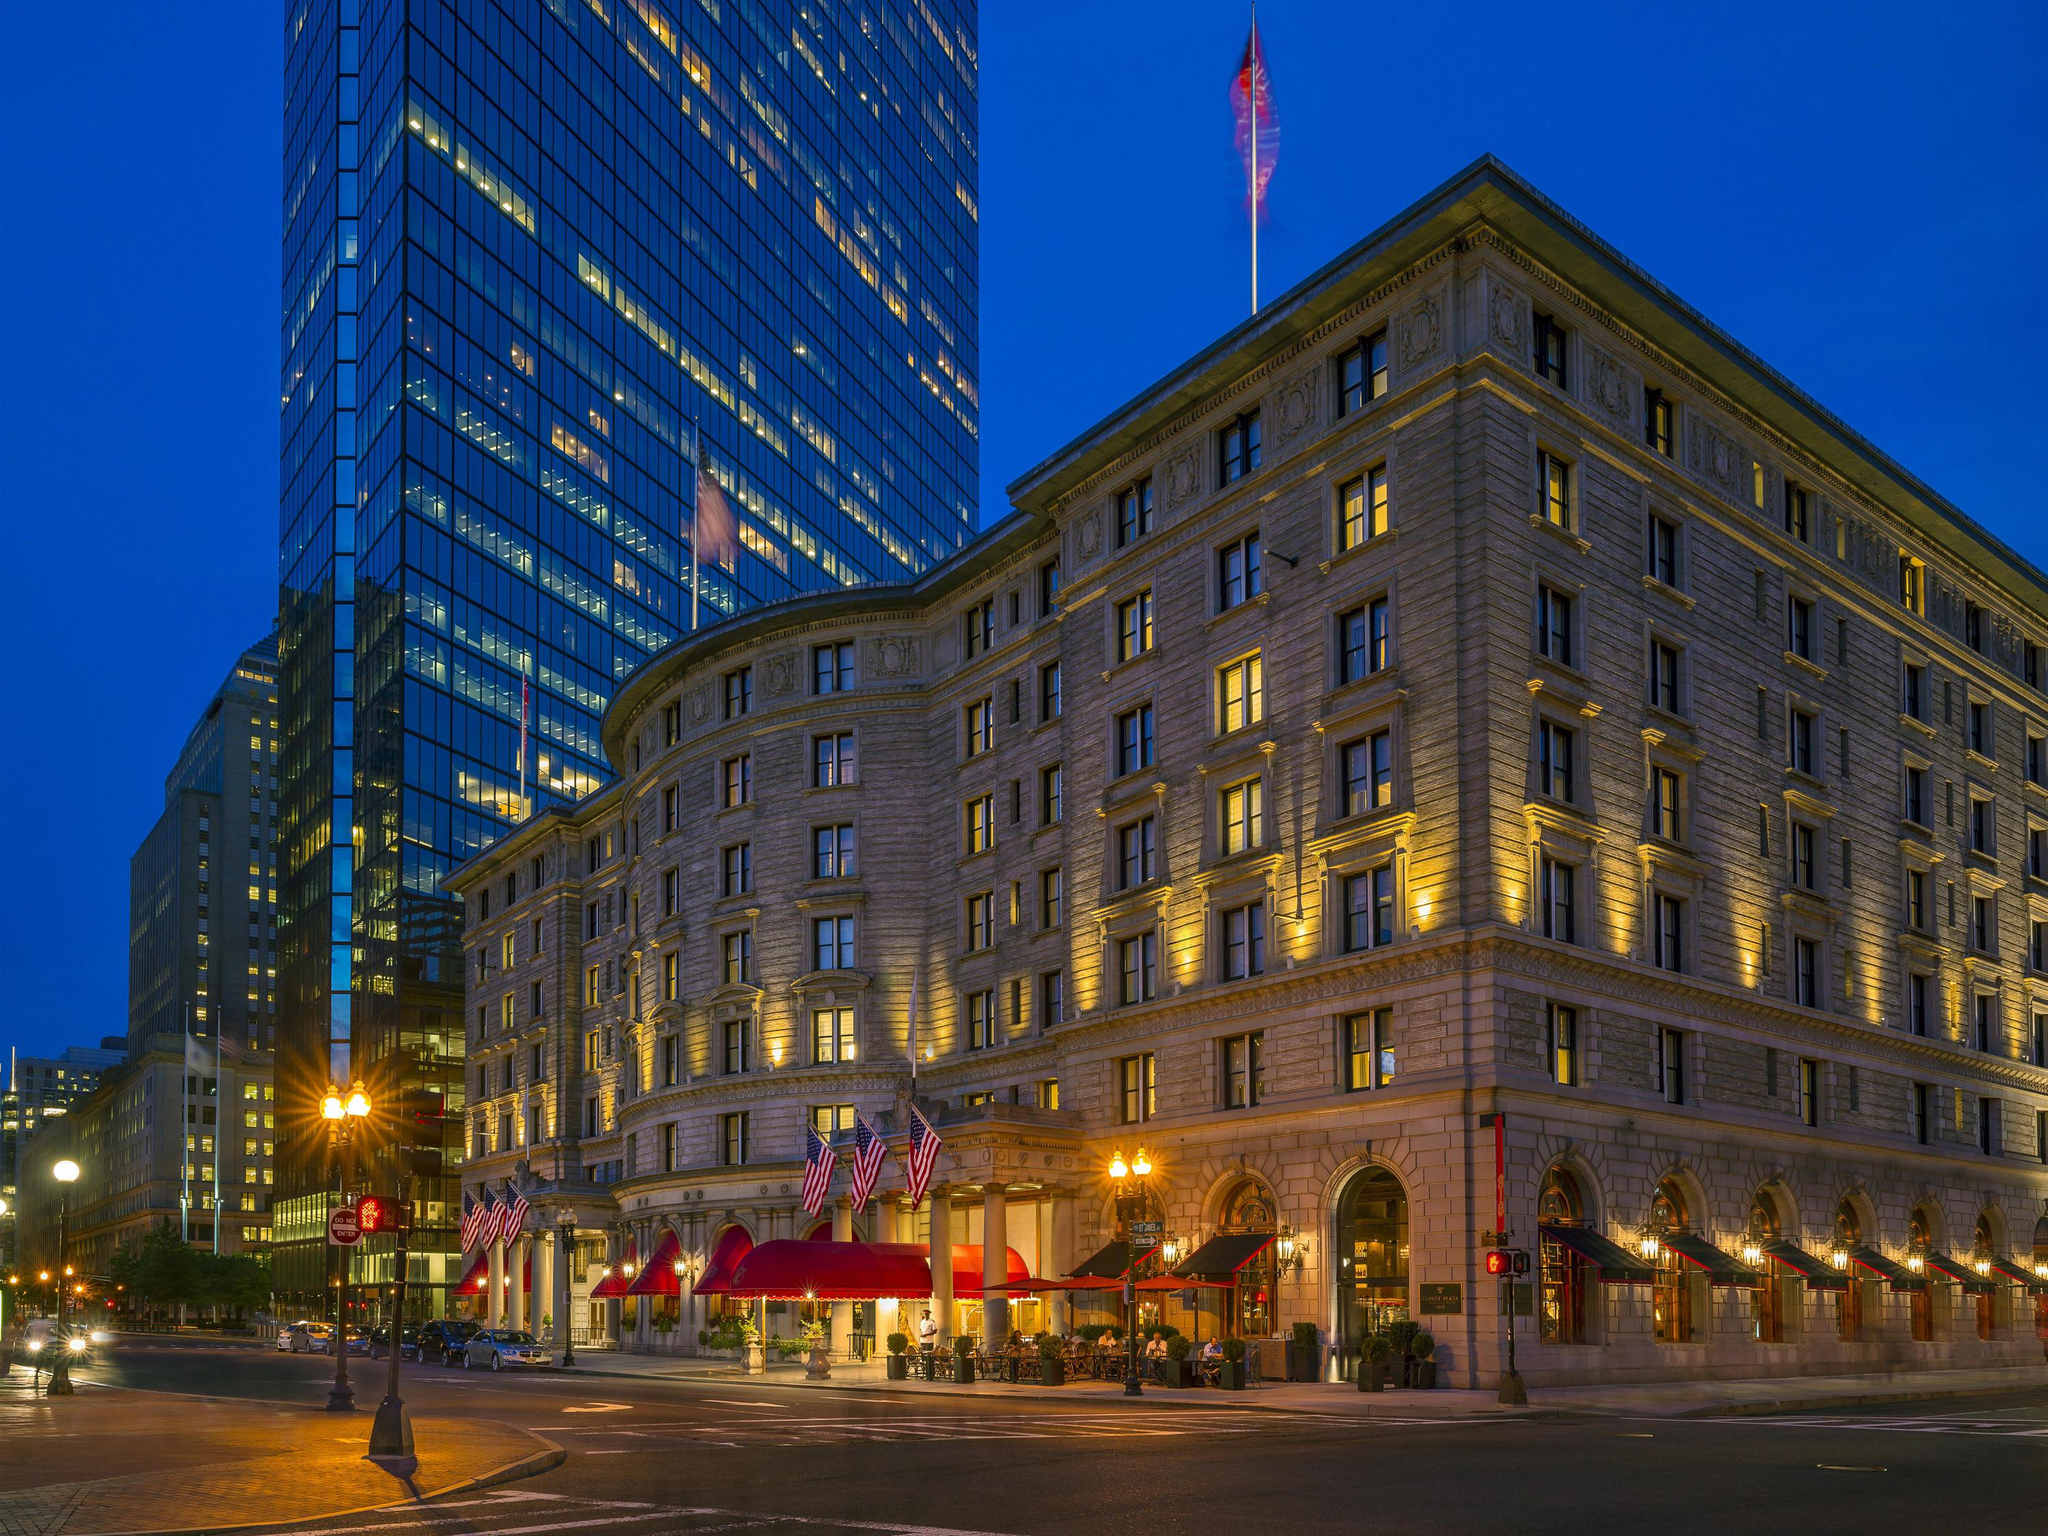 Hotell – Fairmont Copley Plaza